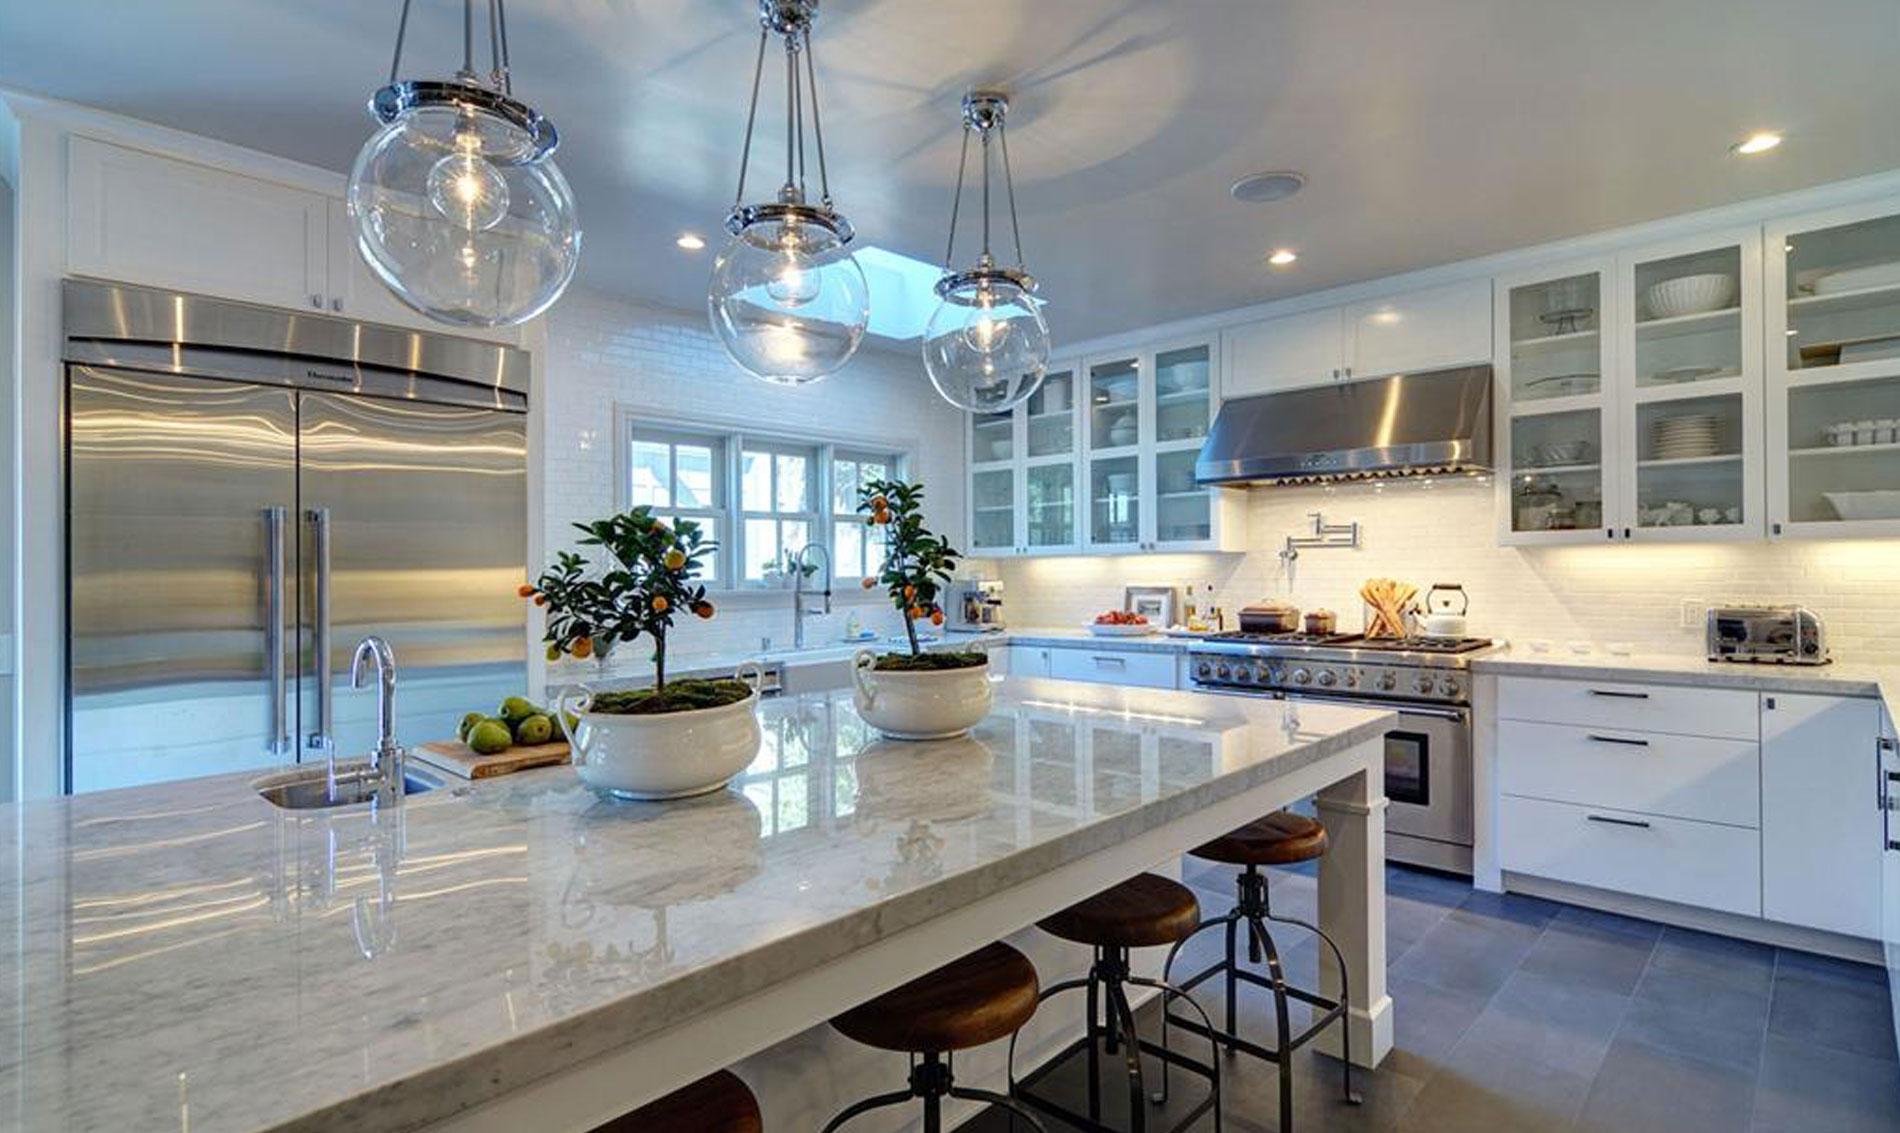 Home - Human Nature Design & Construction, Inc.